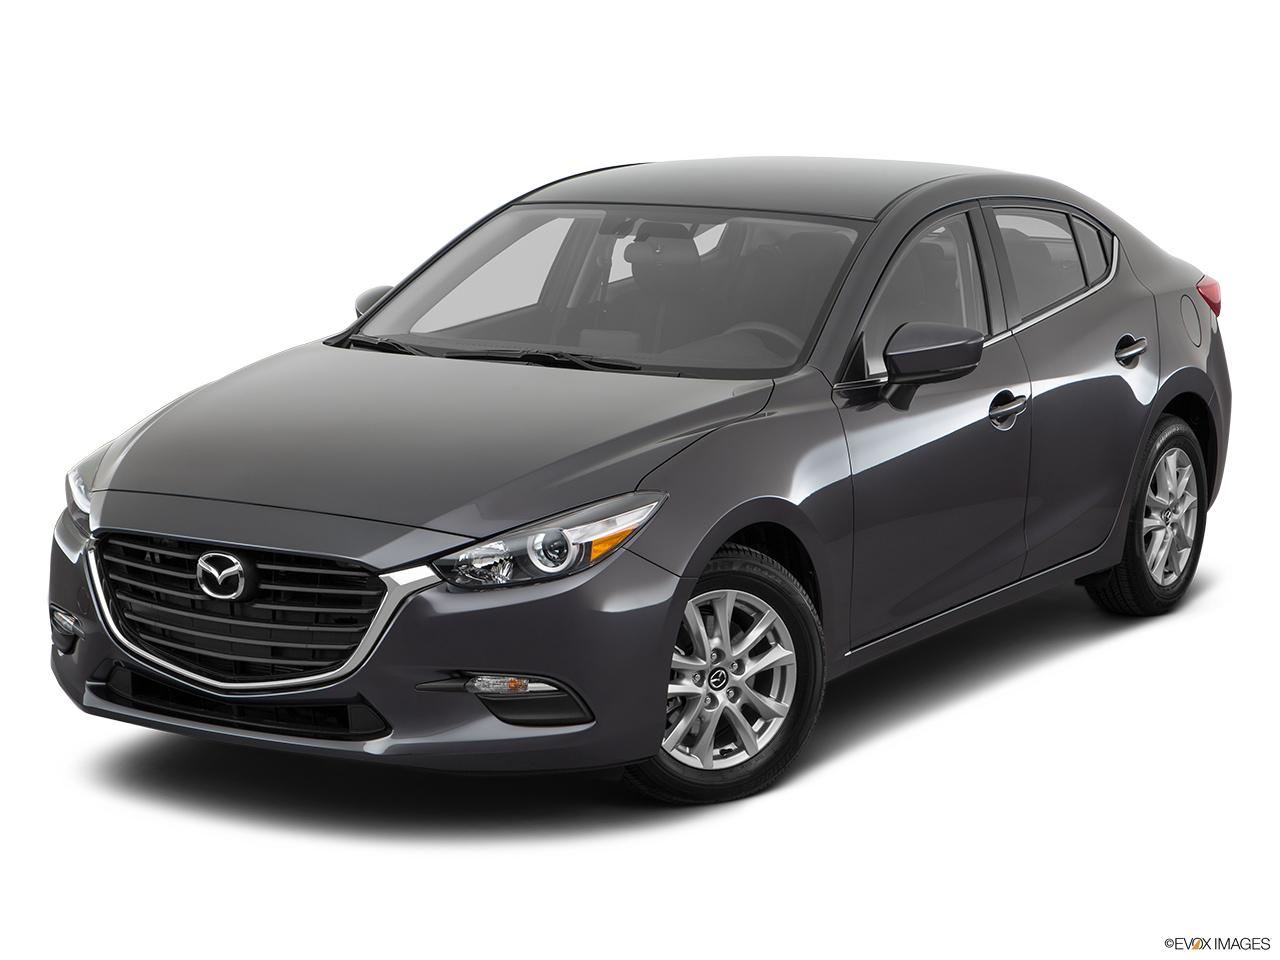 Kelebihan Mazda 3 2018 Tangguh